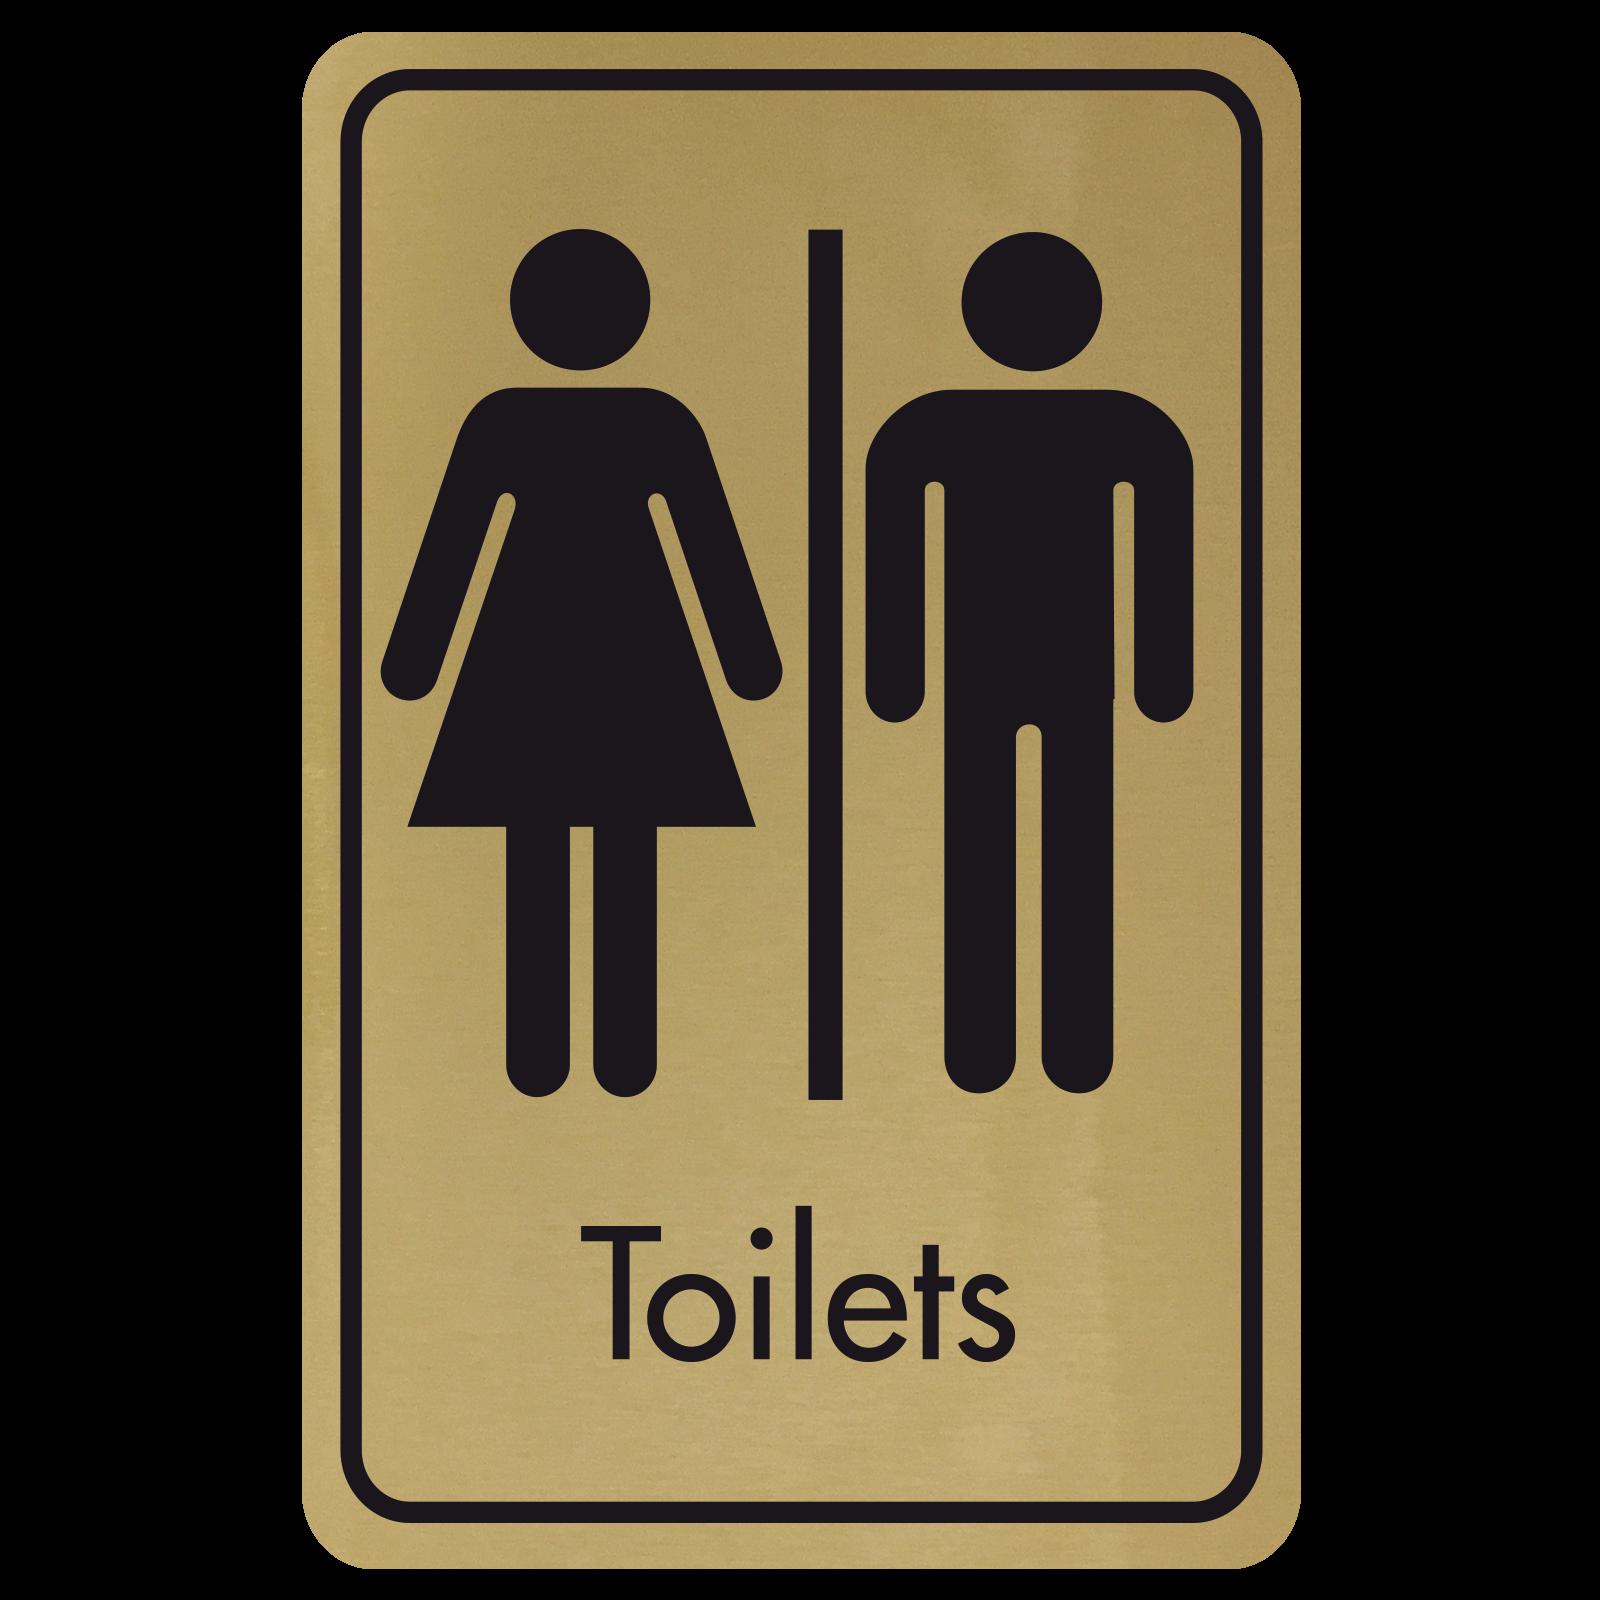 Large Toilets Door Sign - Black on Gold